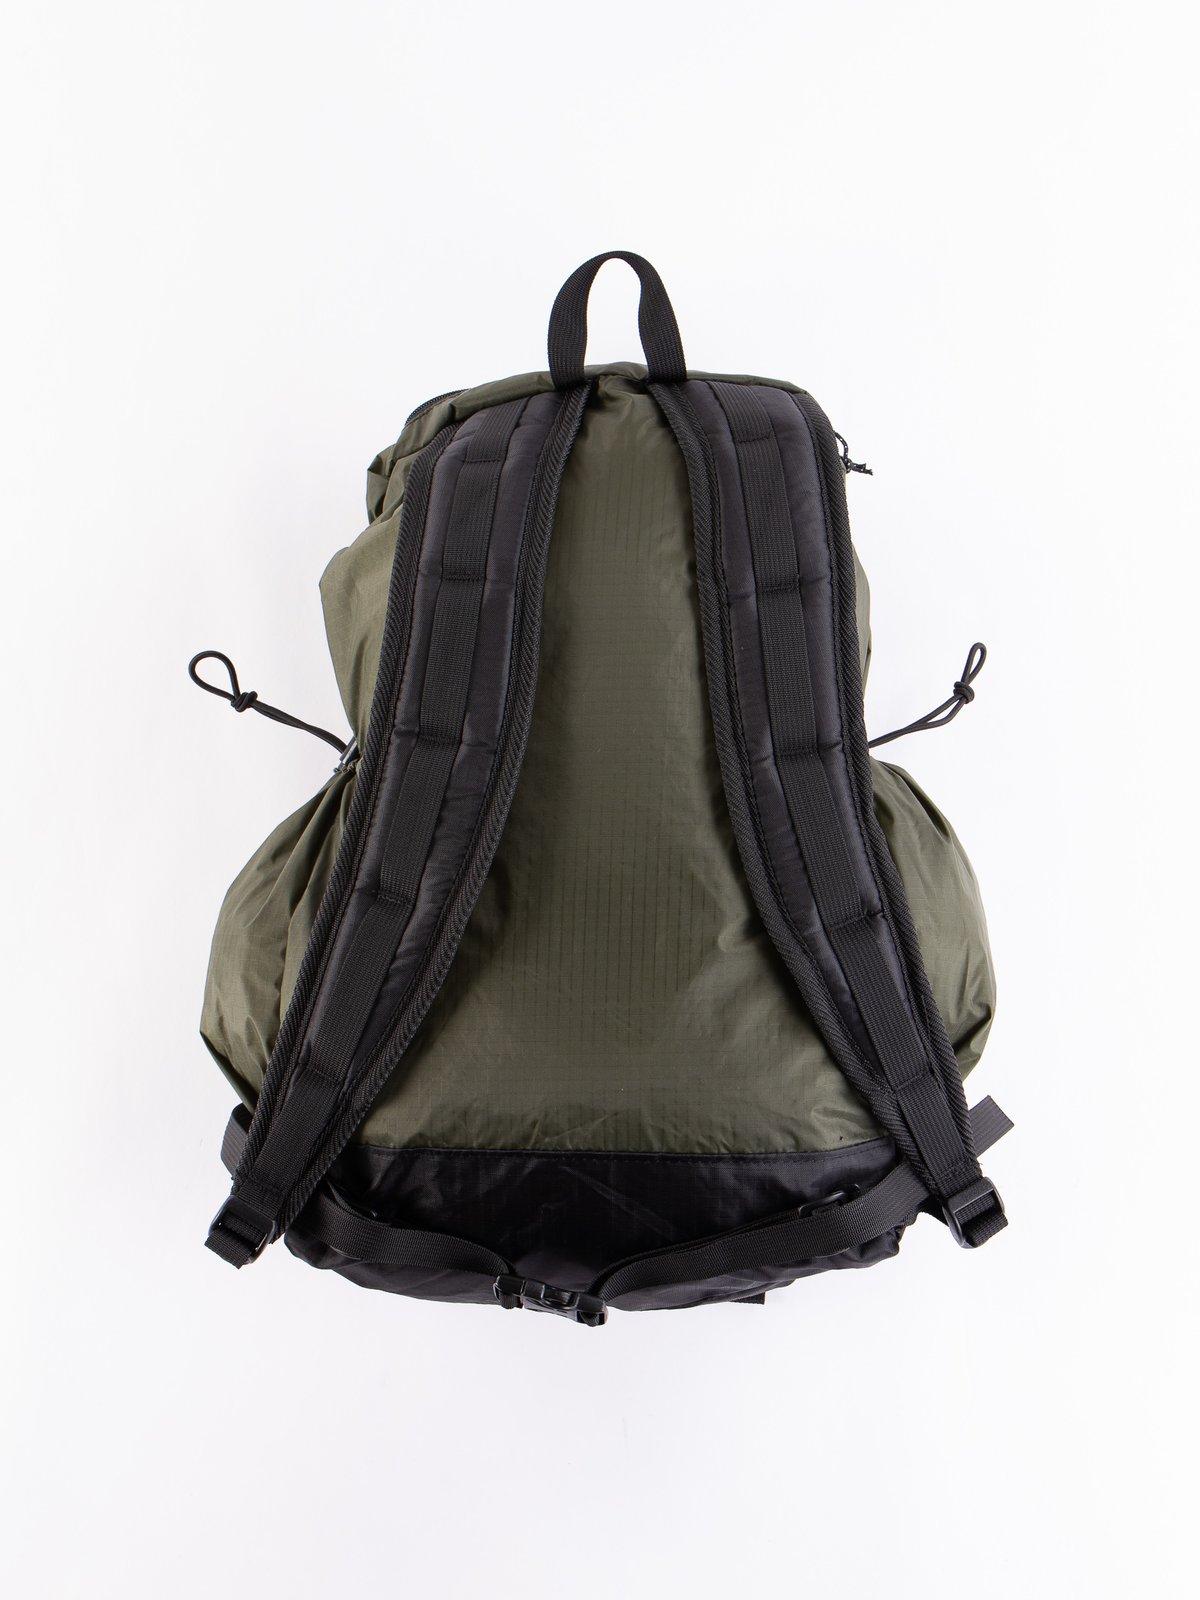 Olive Nylon Ripstop UL Backpack - Image 3